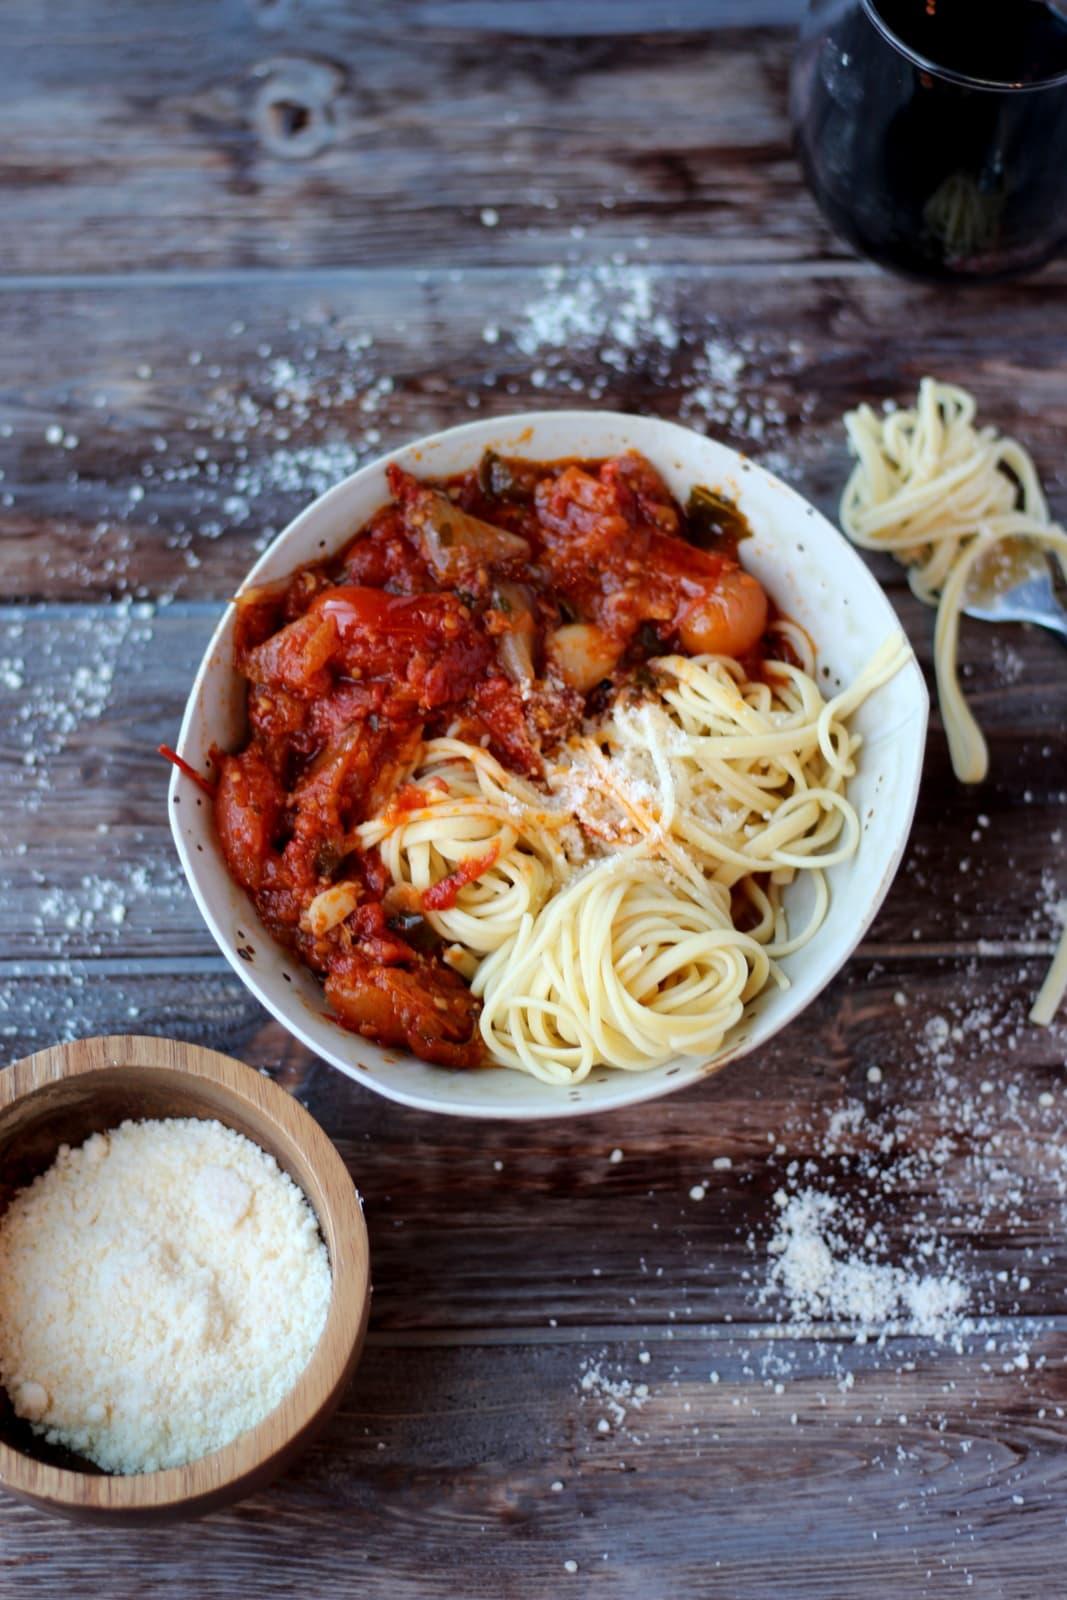 Chunky Roasted Tomato Sauce + Noodles - thewoodenskillet.com #pasta #marinara #spaghettisauce #homemade